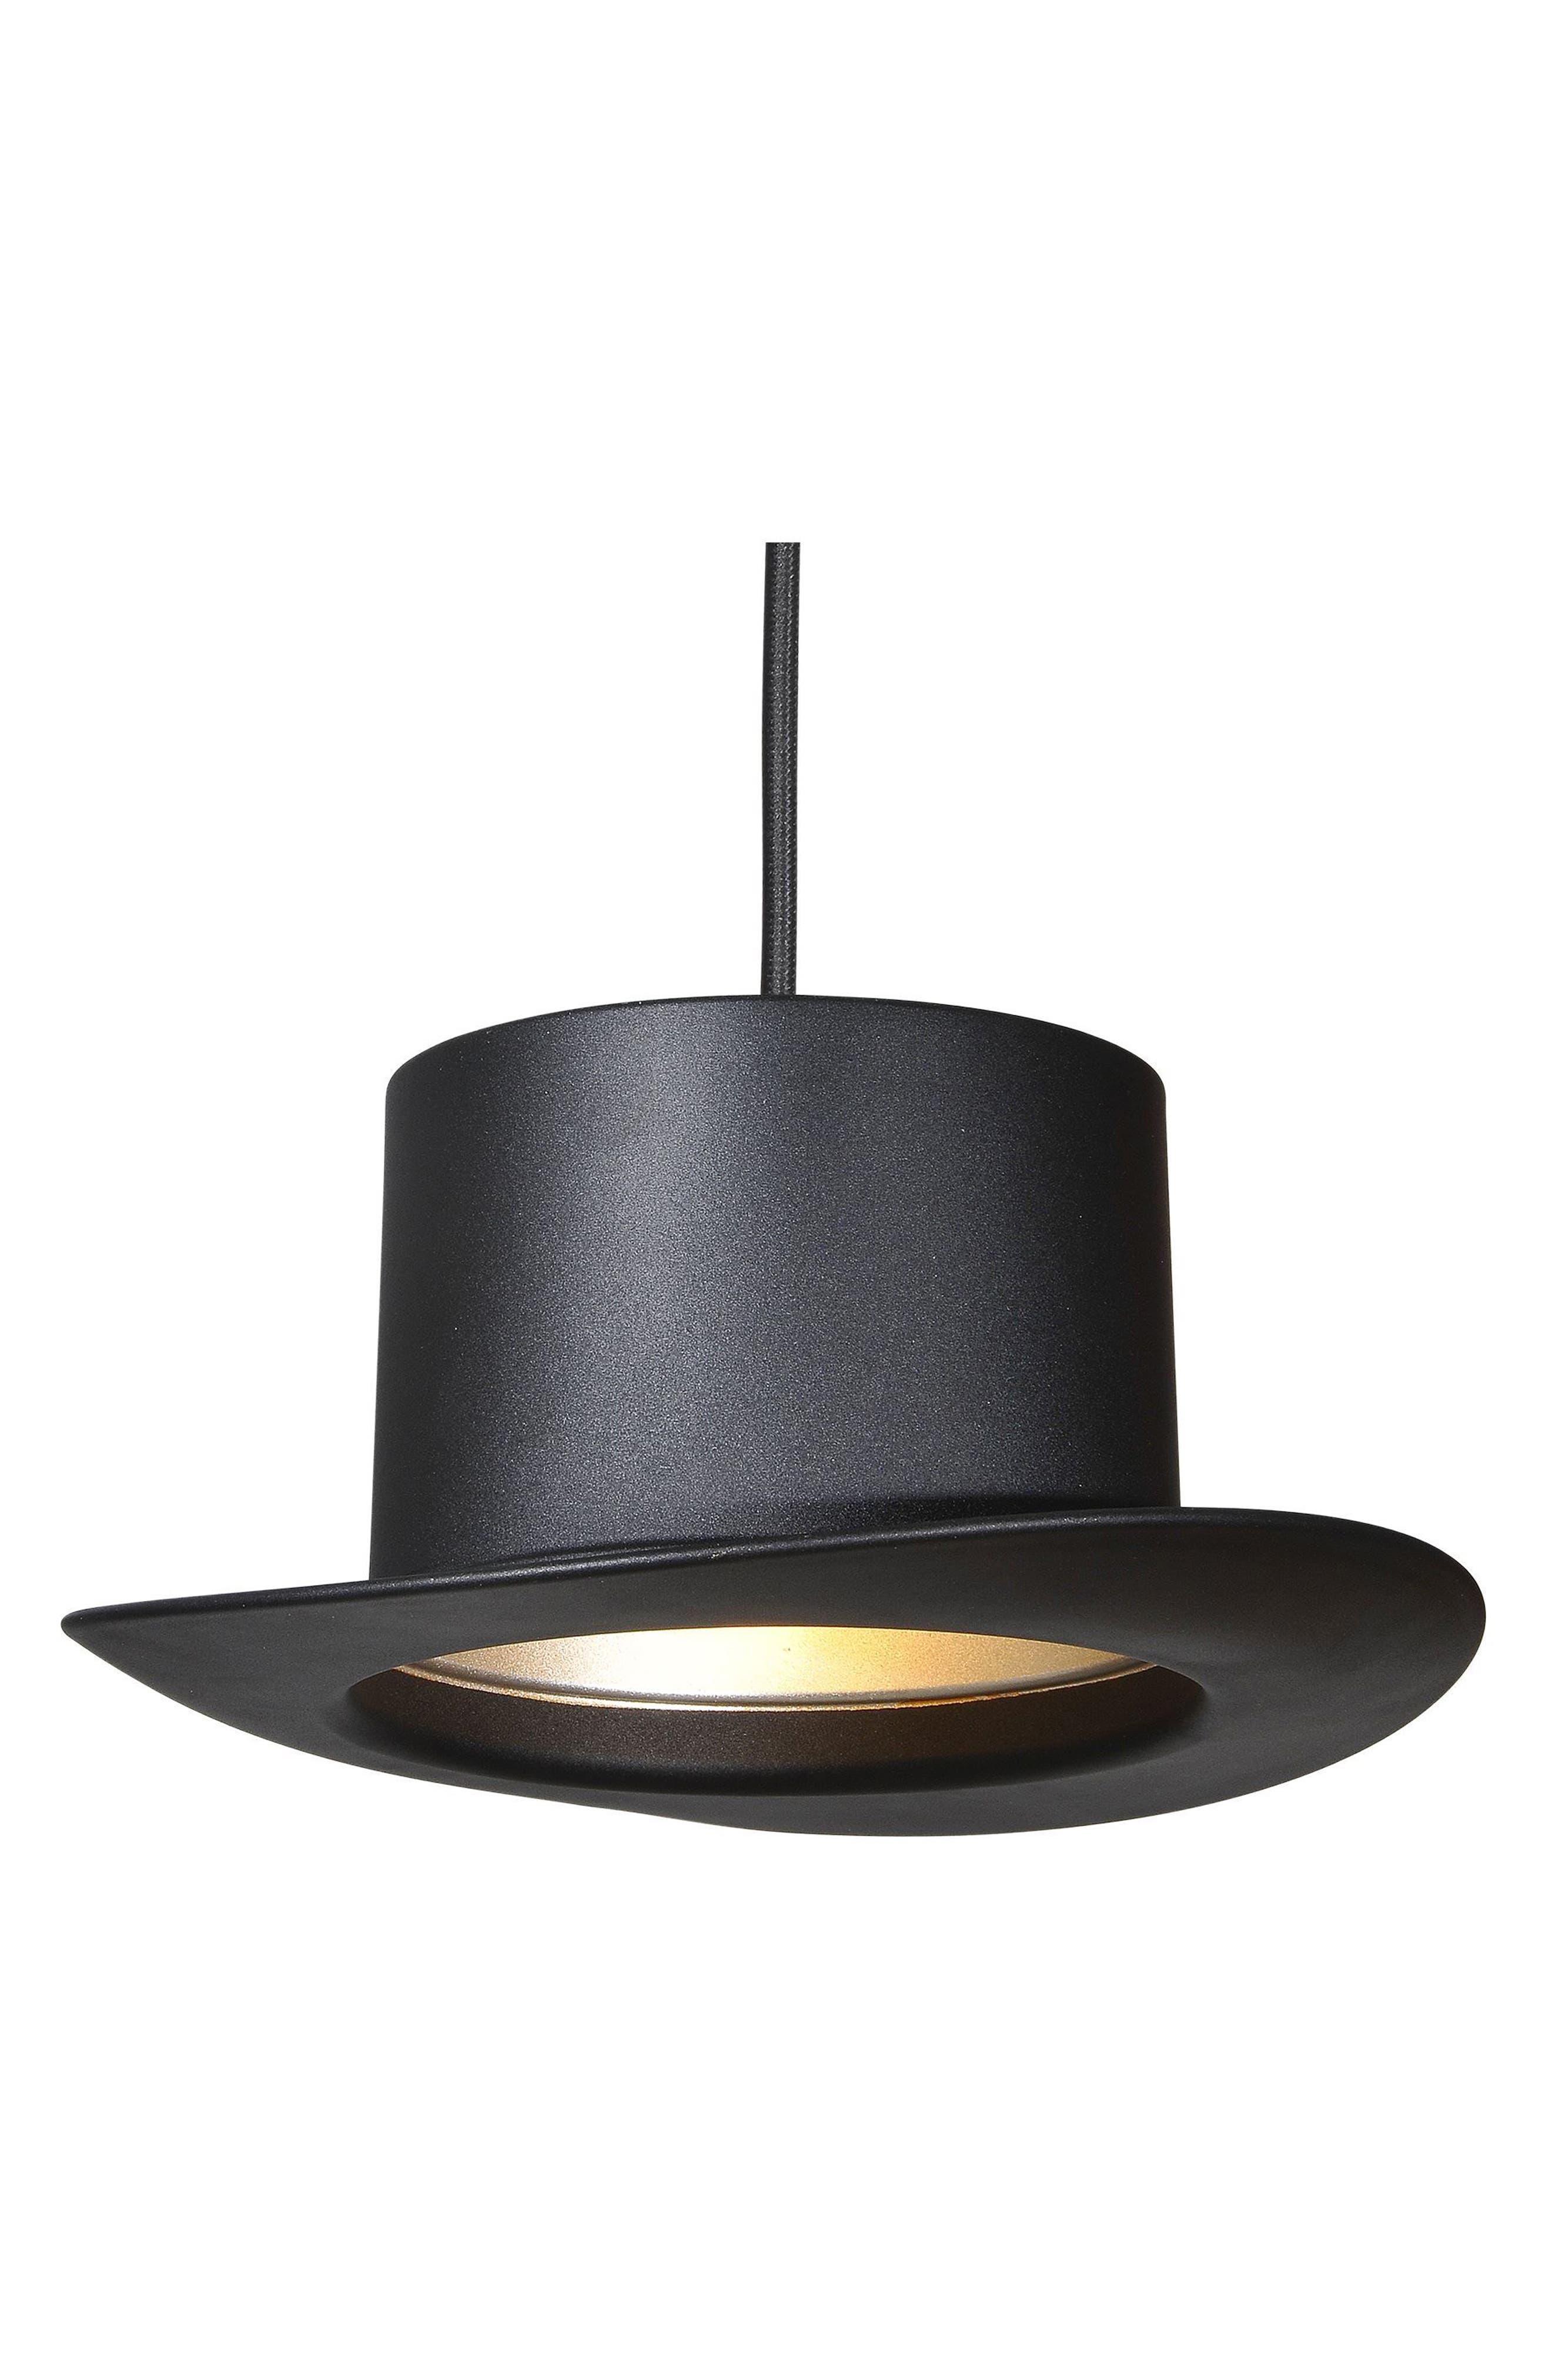 Langley Top Hat Ceiling Fixture,                             Alternate thumbnail 2, color,                             001